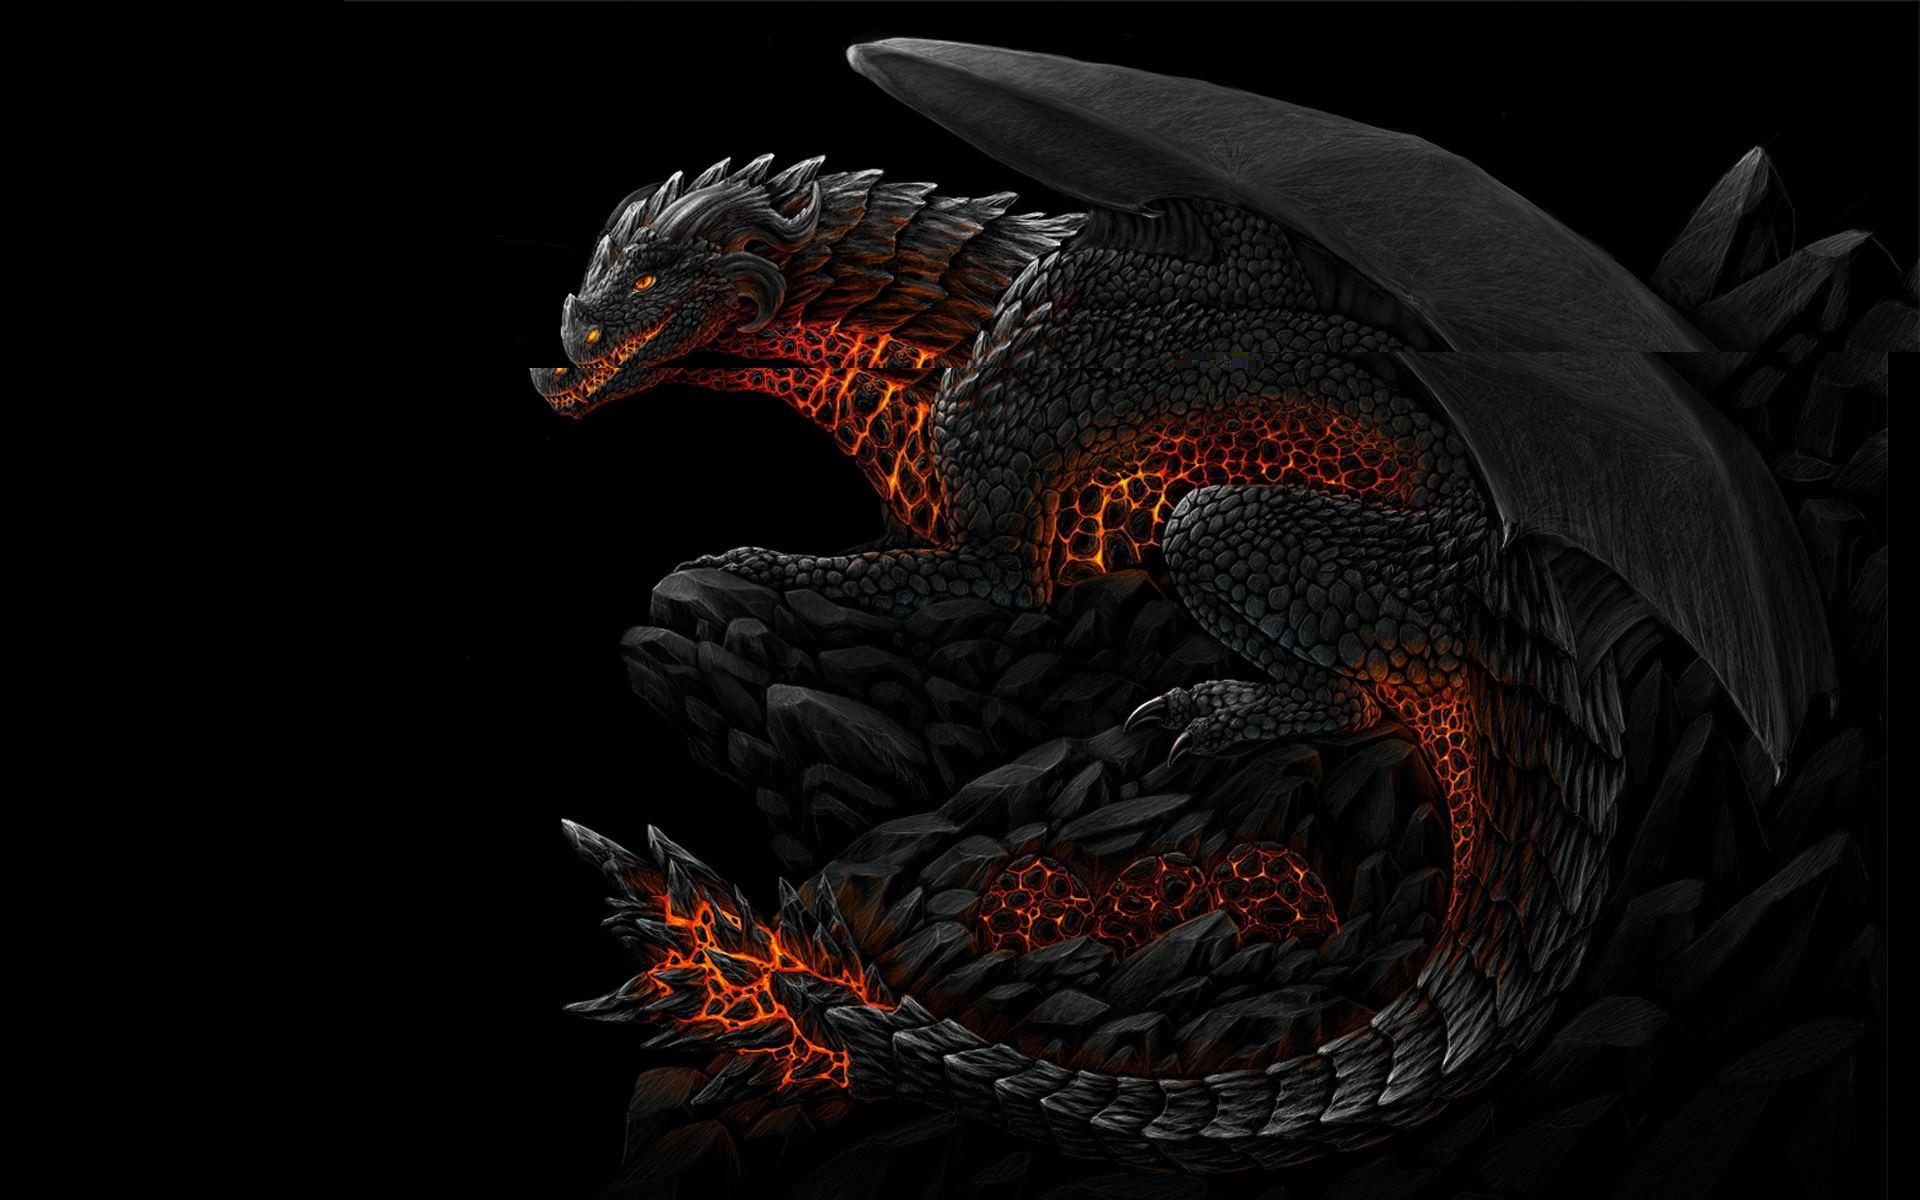 Free Download Dark Dragon Wallpaper Widescreen 1920x1200 For